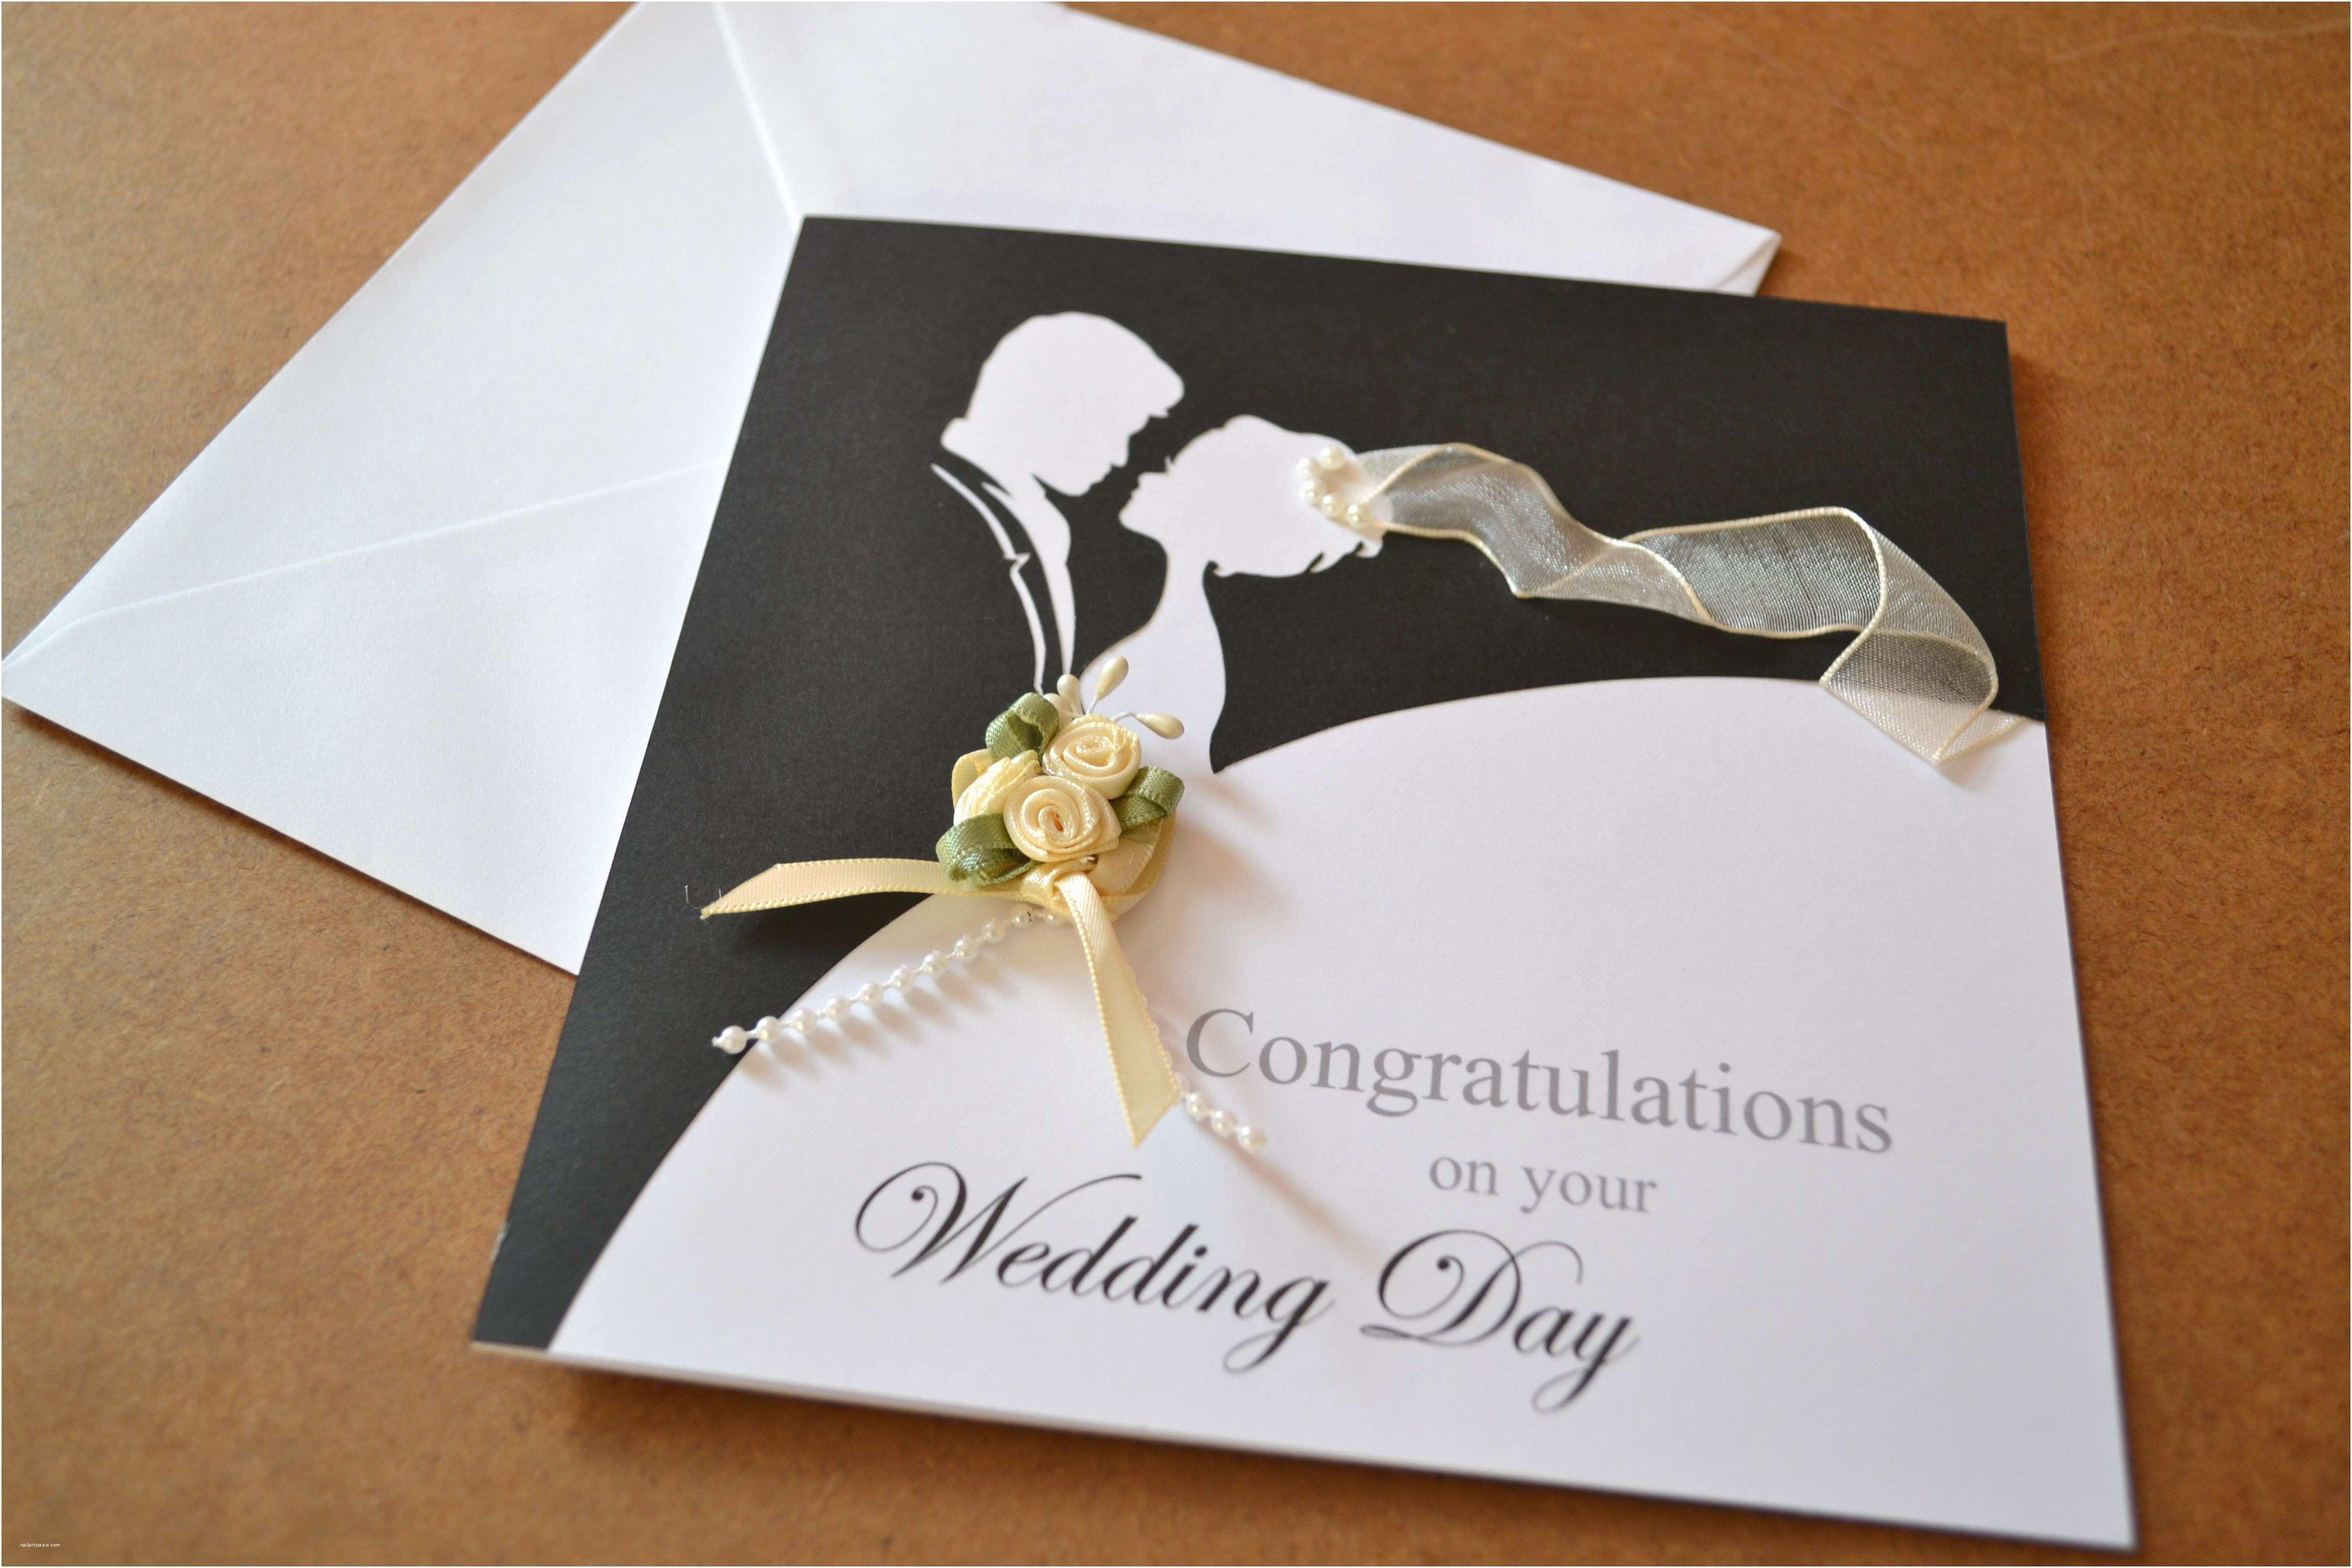 Create Your Own Wedding Invitations Design Wedding Invitations